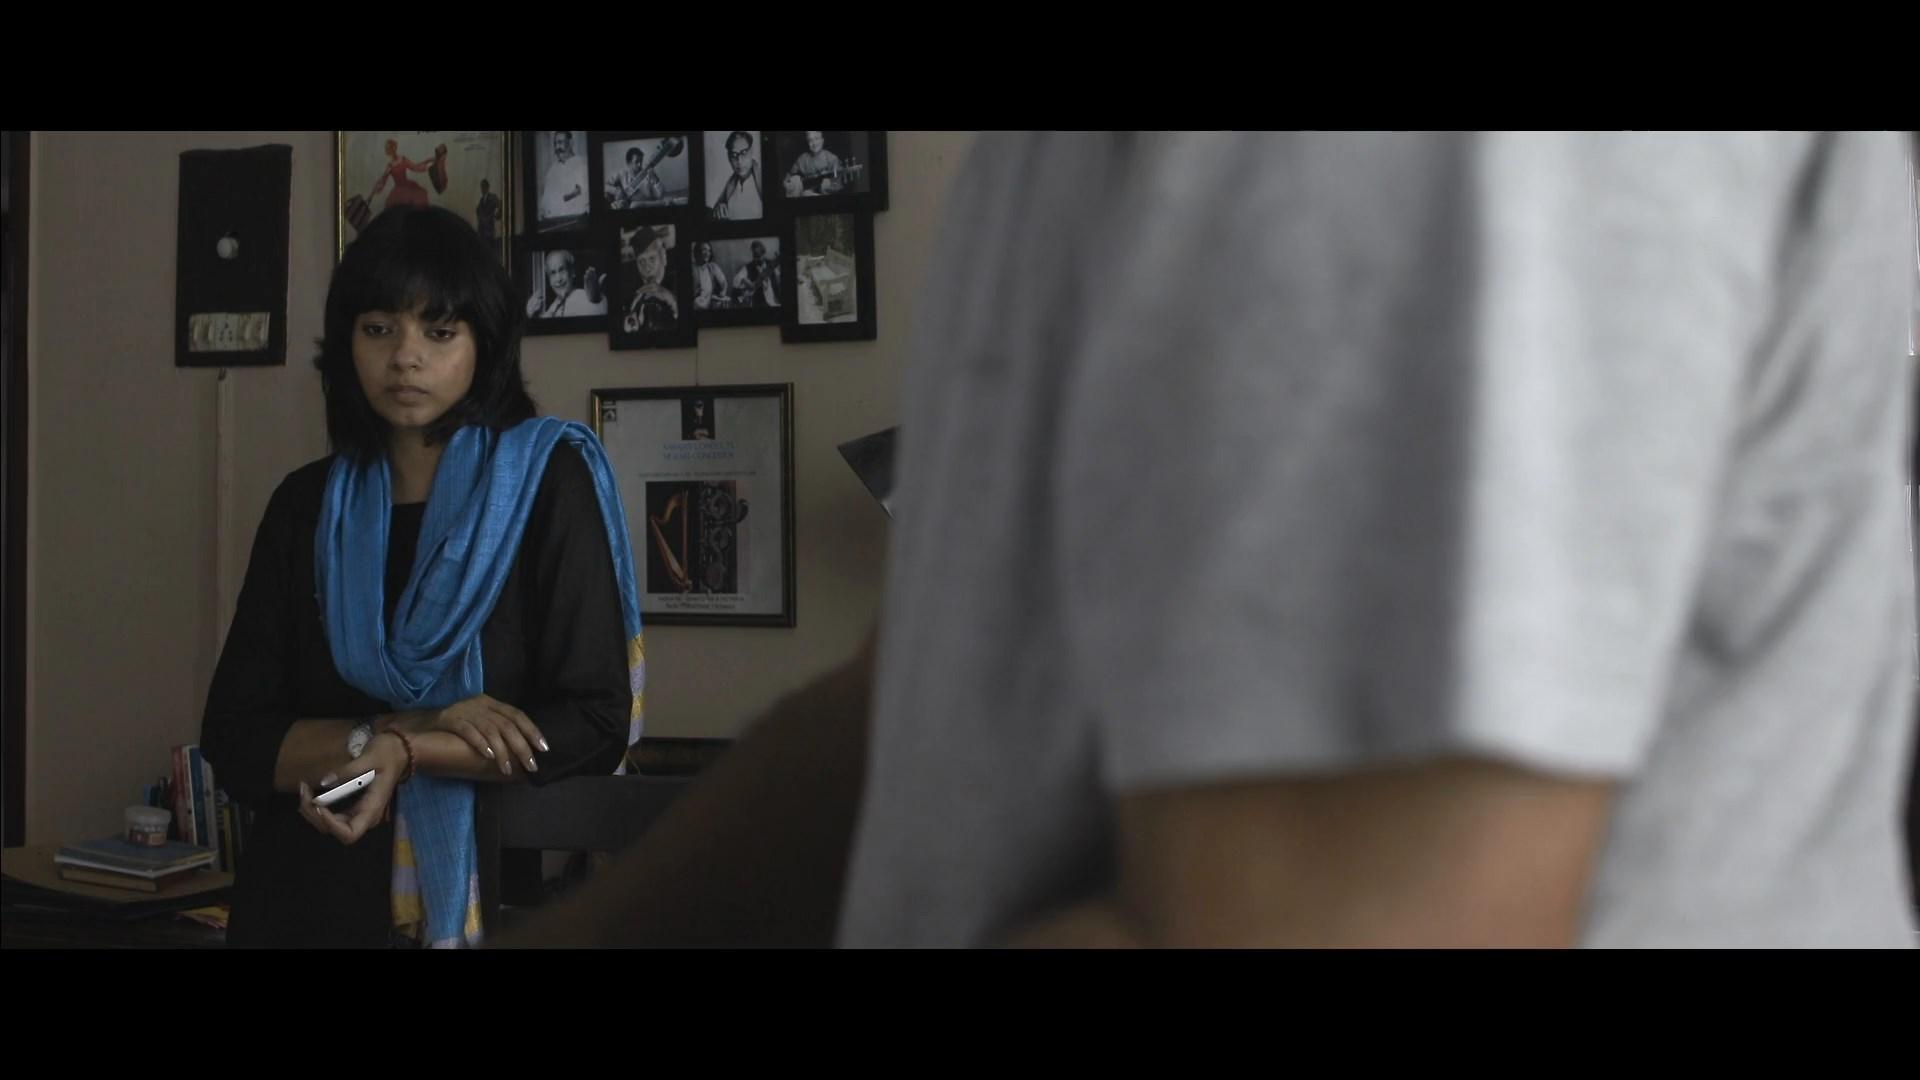 Ekti Bangali Bhooter Goppo 2021 Bengali 1080p WEB DL x264.mkv snapshot 01.45.26.000